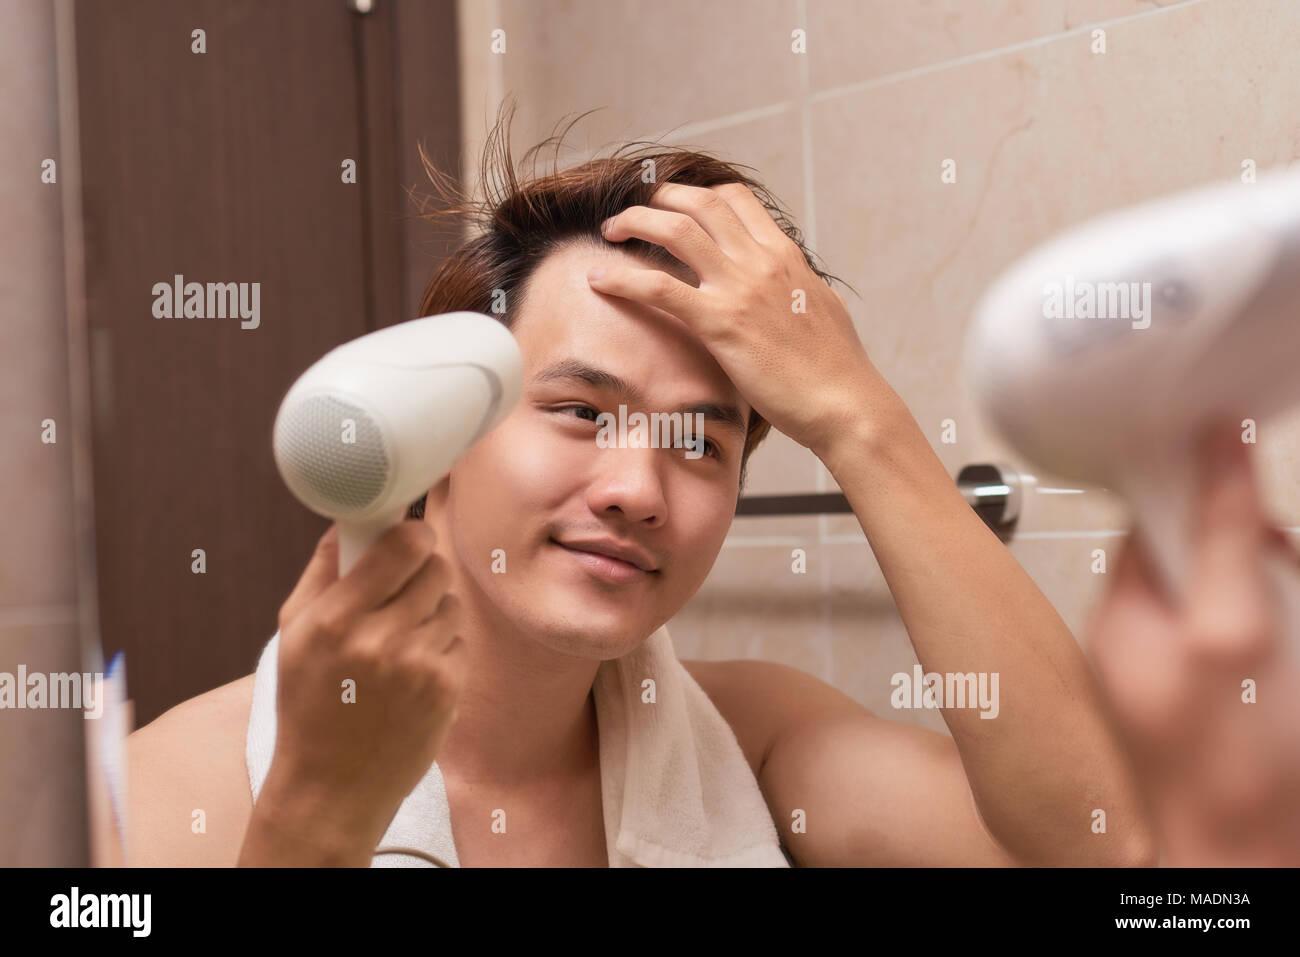 Young Asian man blow drying hair dans salle de bains Photo Stock